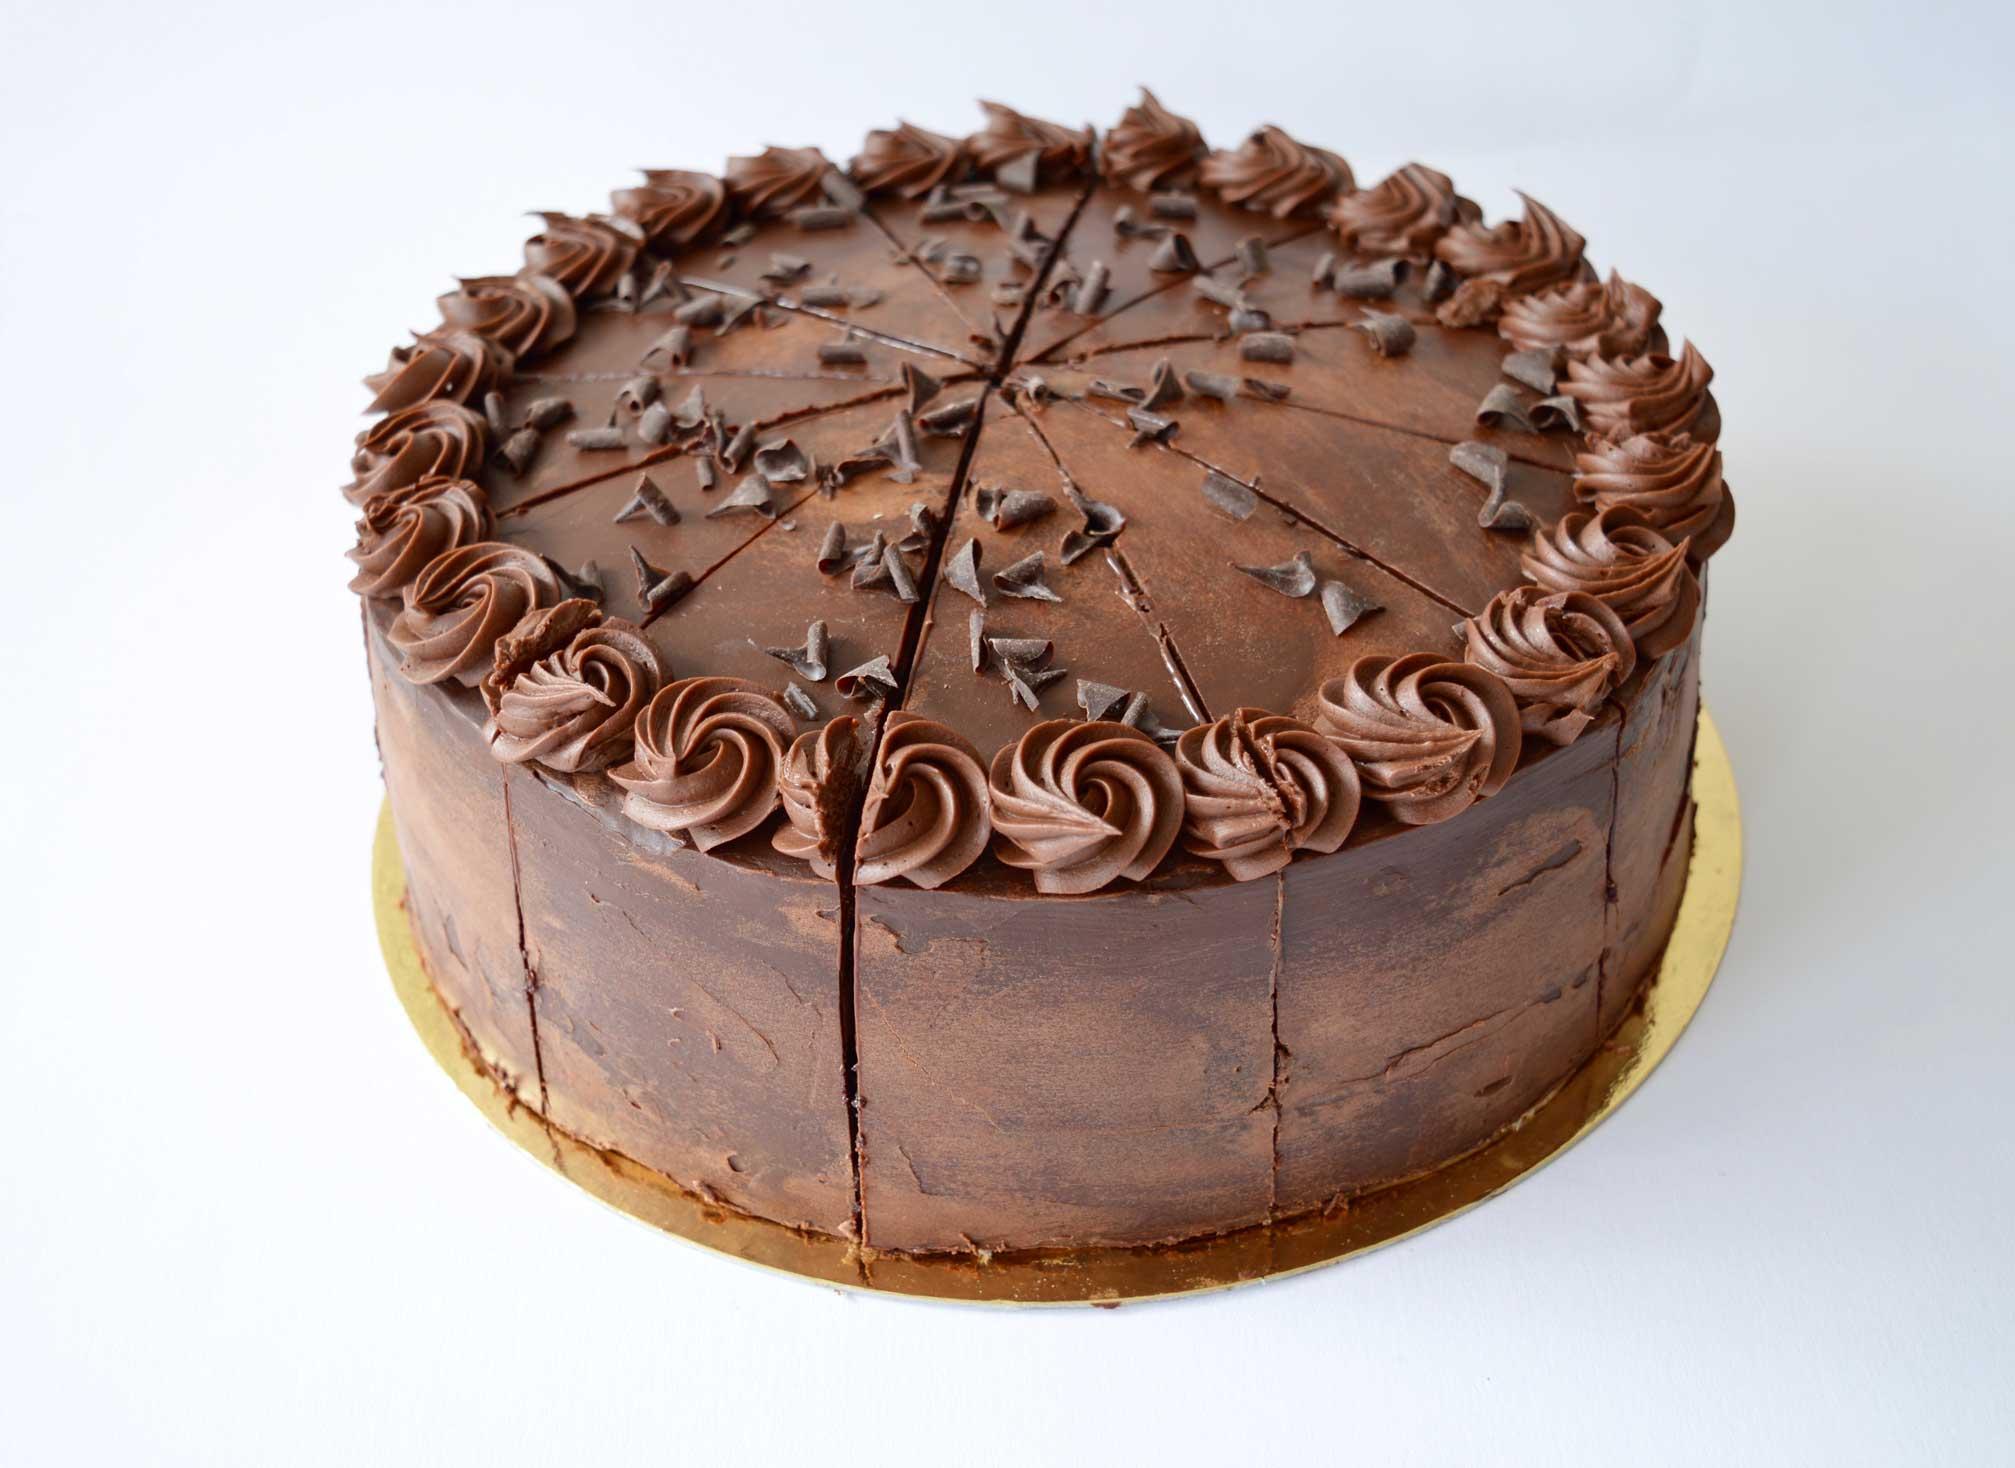 Chocolate-cake, chocolade-taart-denhaag, verjaardags-taart-bestellen-denhaag